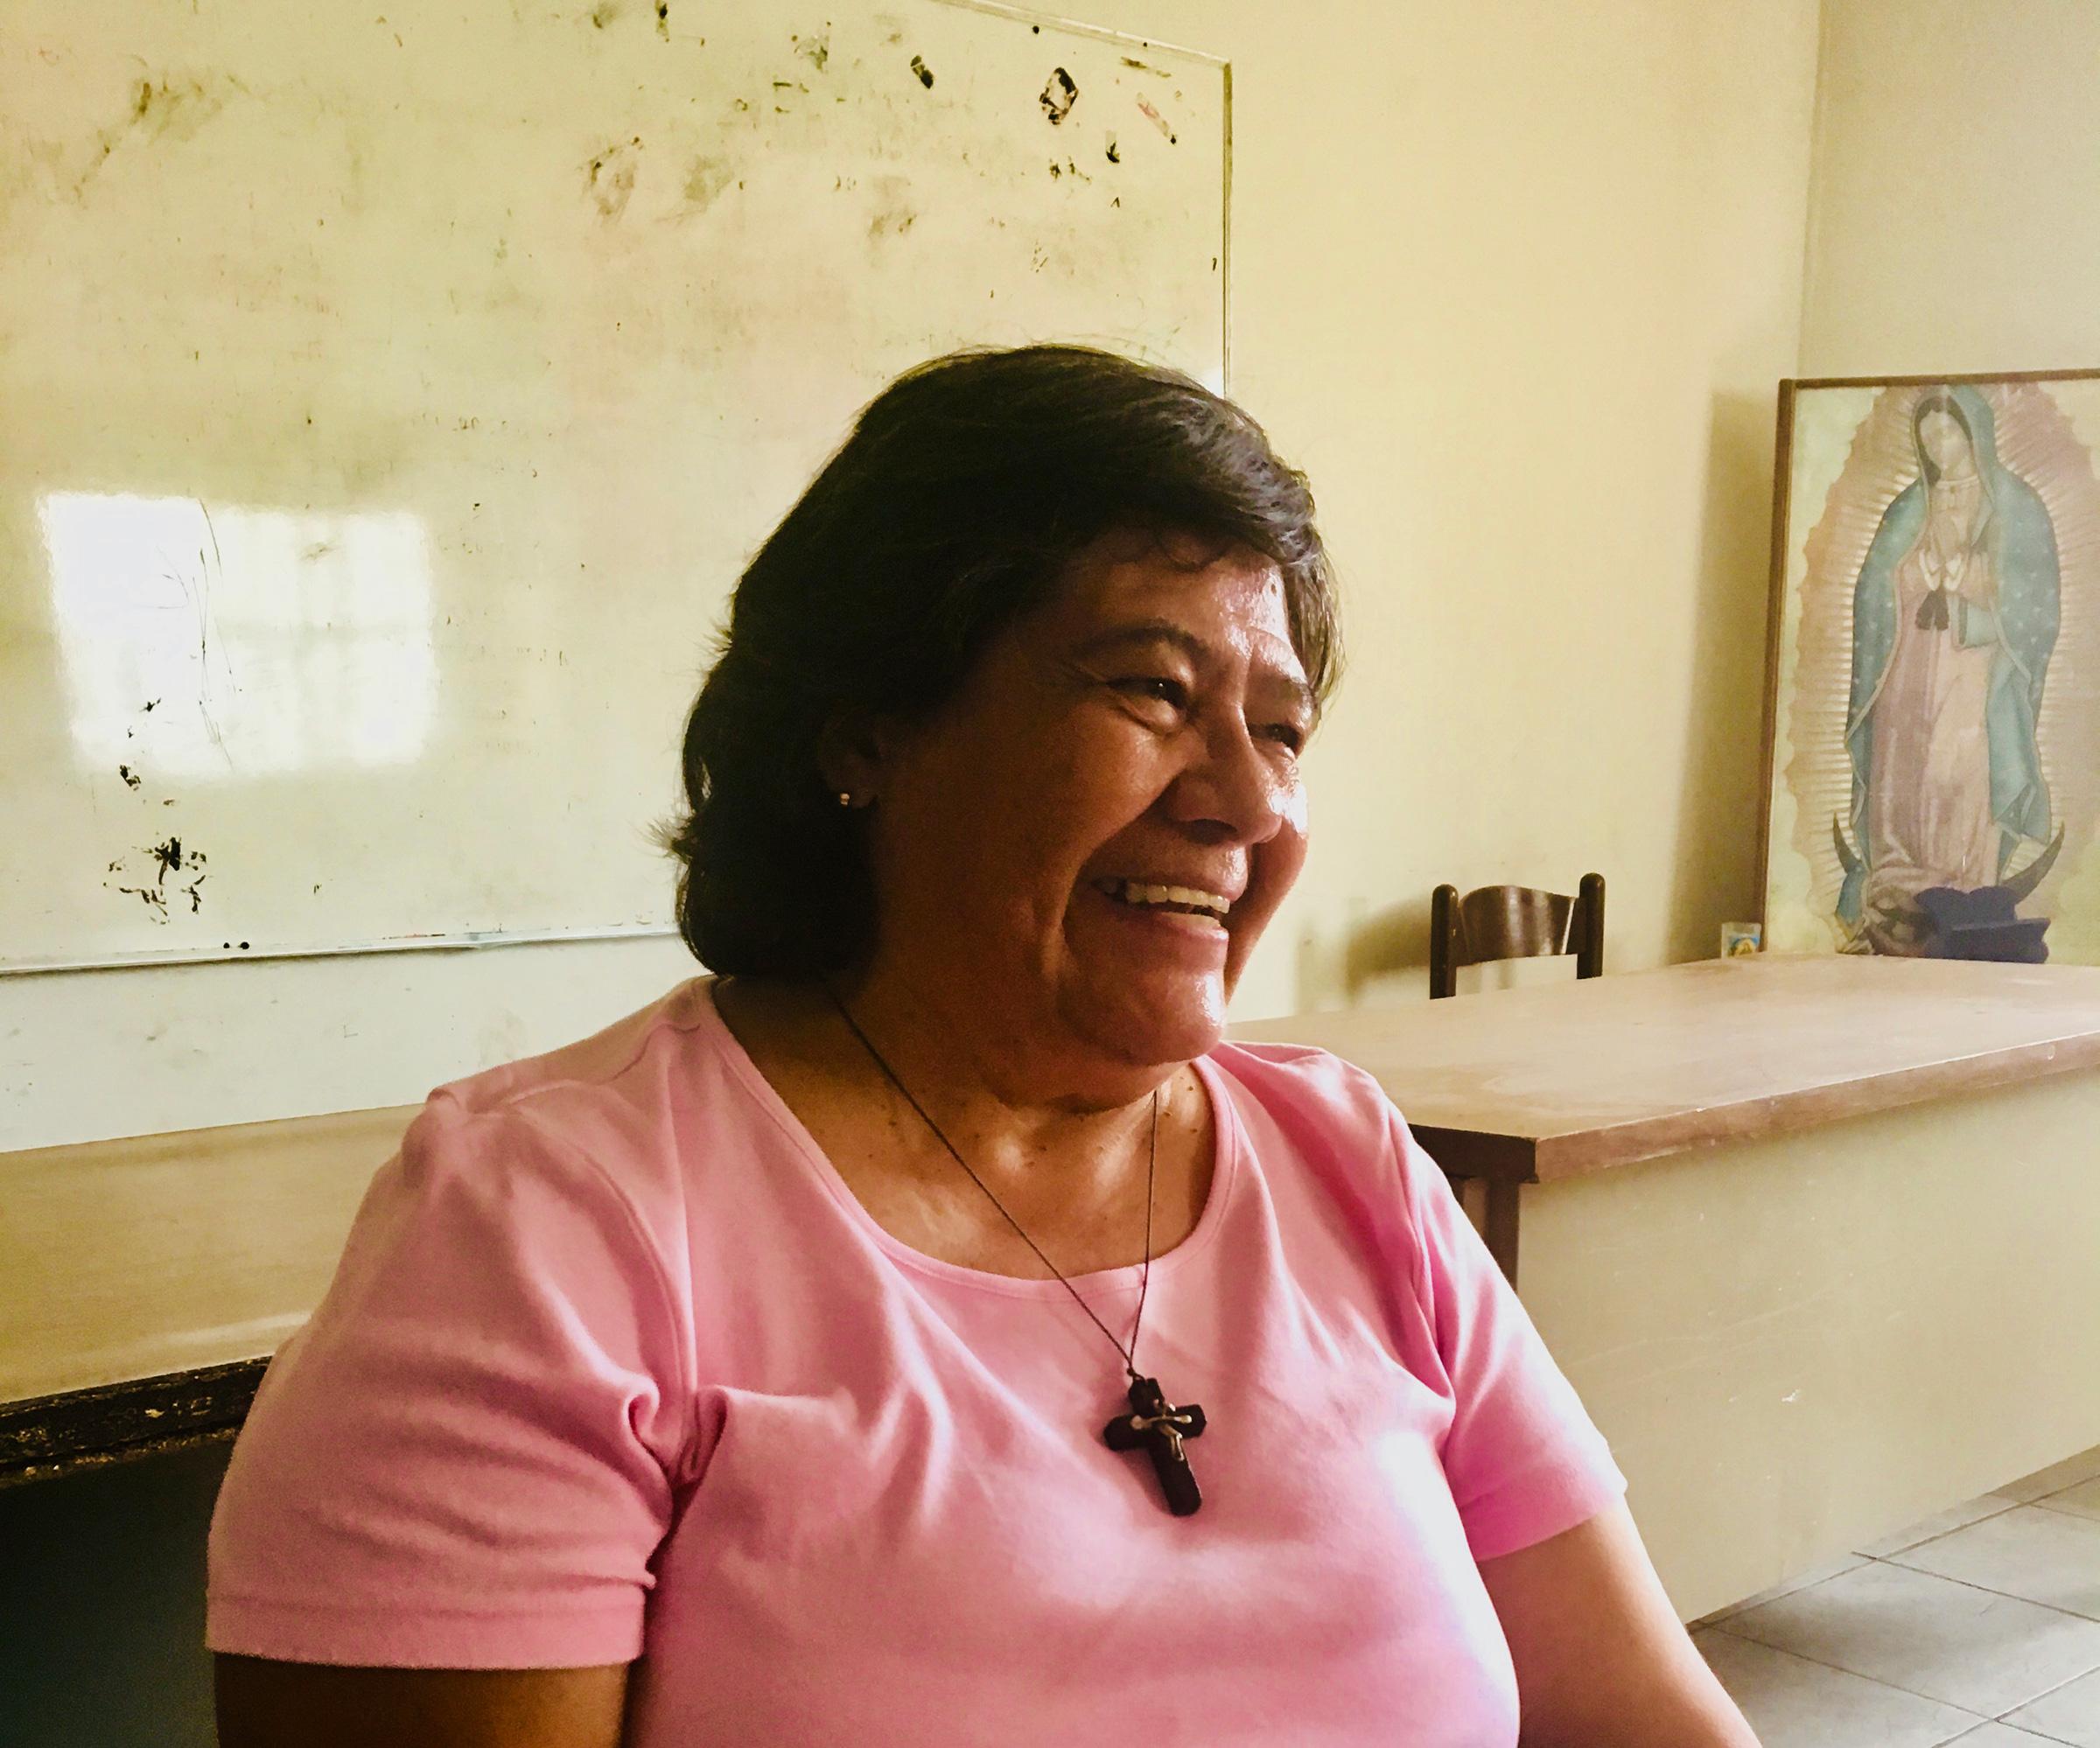 Sister Maria Antonia Aranda in the Juárez church where she works with migrants.